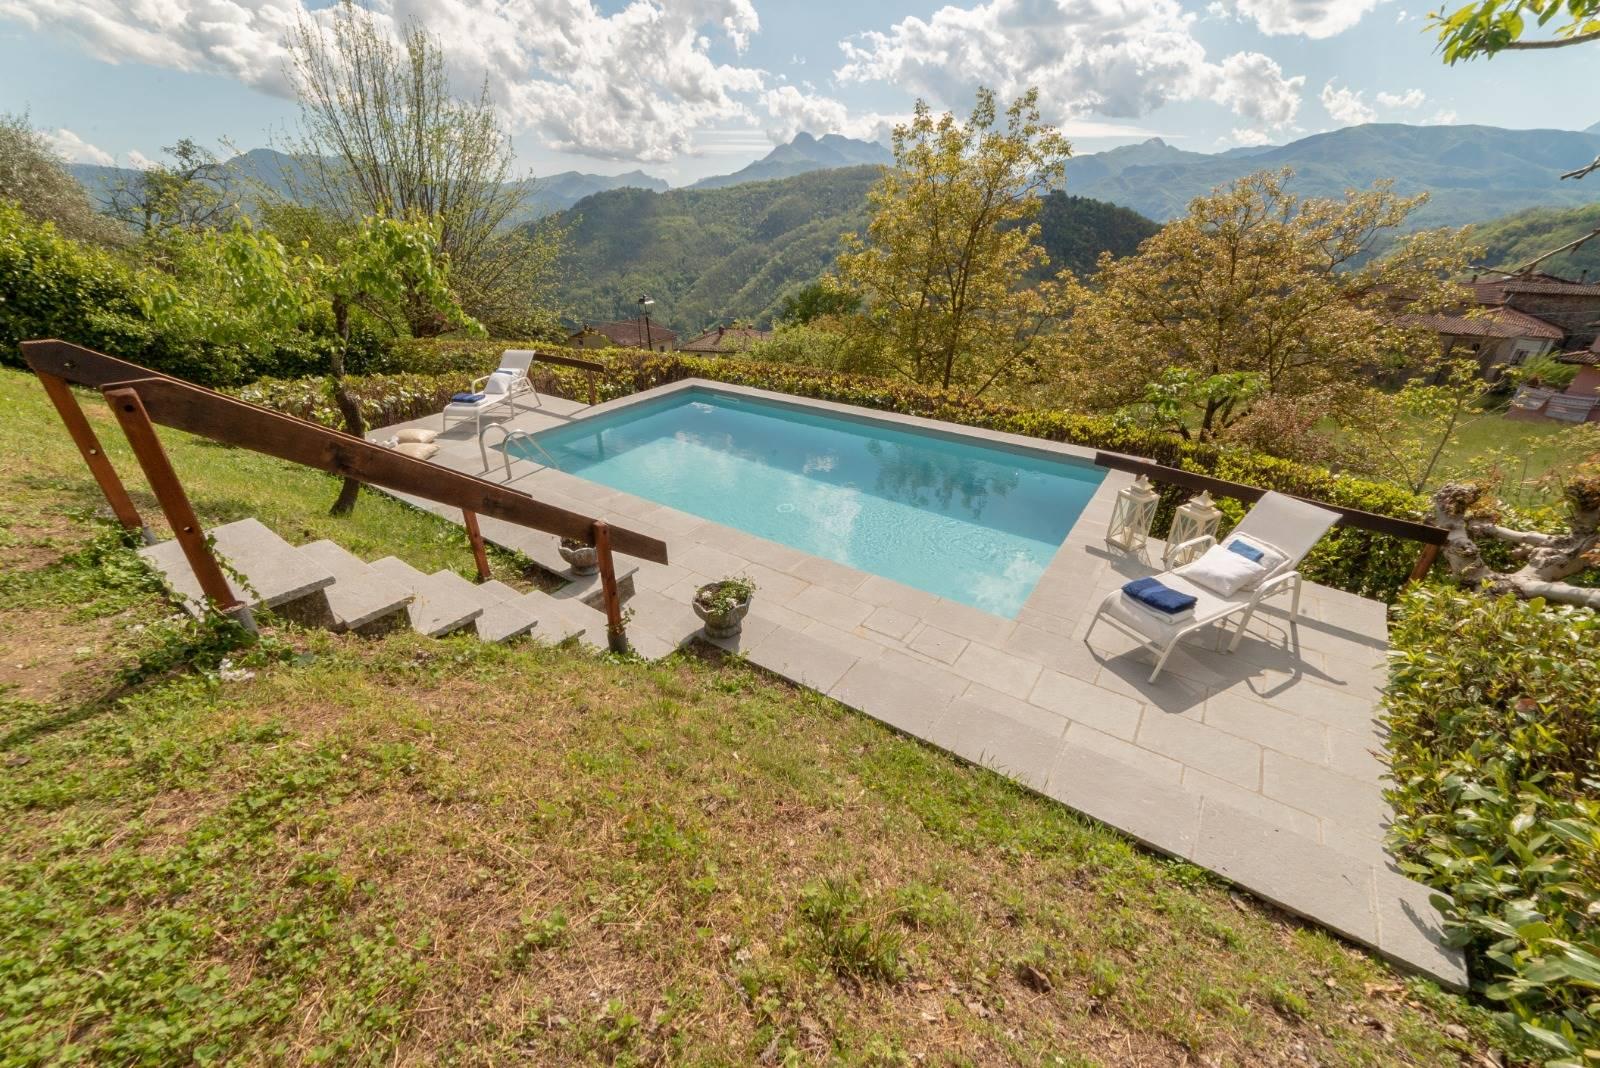 Accesso all'area piscina - Access to the pool area